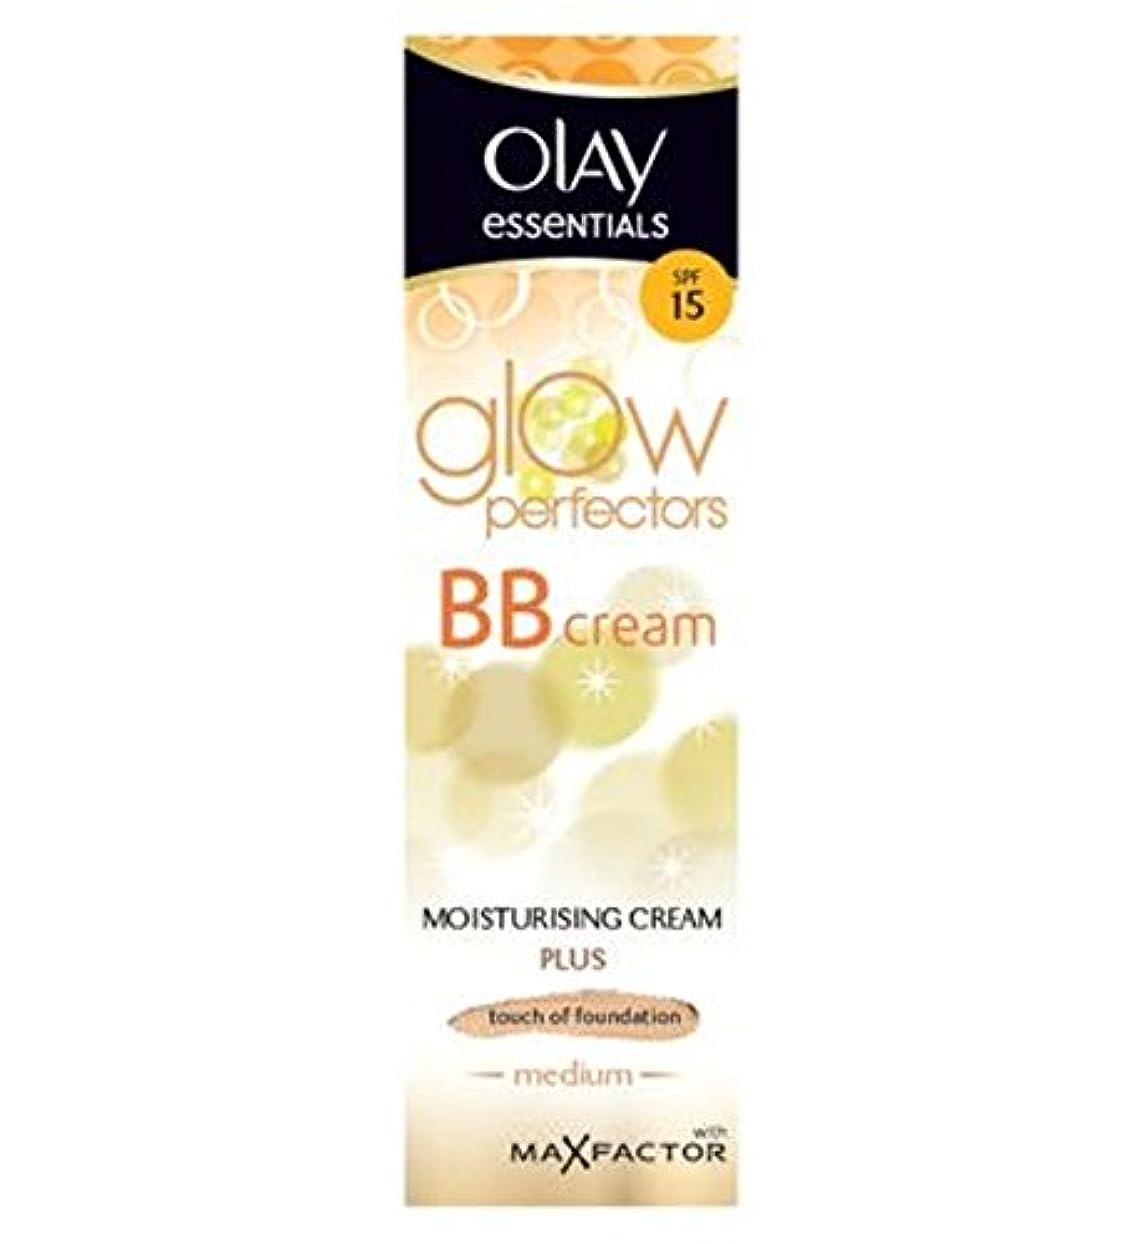 Olay Complete BB Cream SPF15 Skin Perfecting Tinted Moisturiser 50ml - Medium - 着色保湿50ミリリットルを完成オーレイ完全なBbクリームSpf15スキン - 中 (Olay) [並行輸入品]